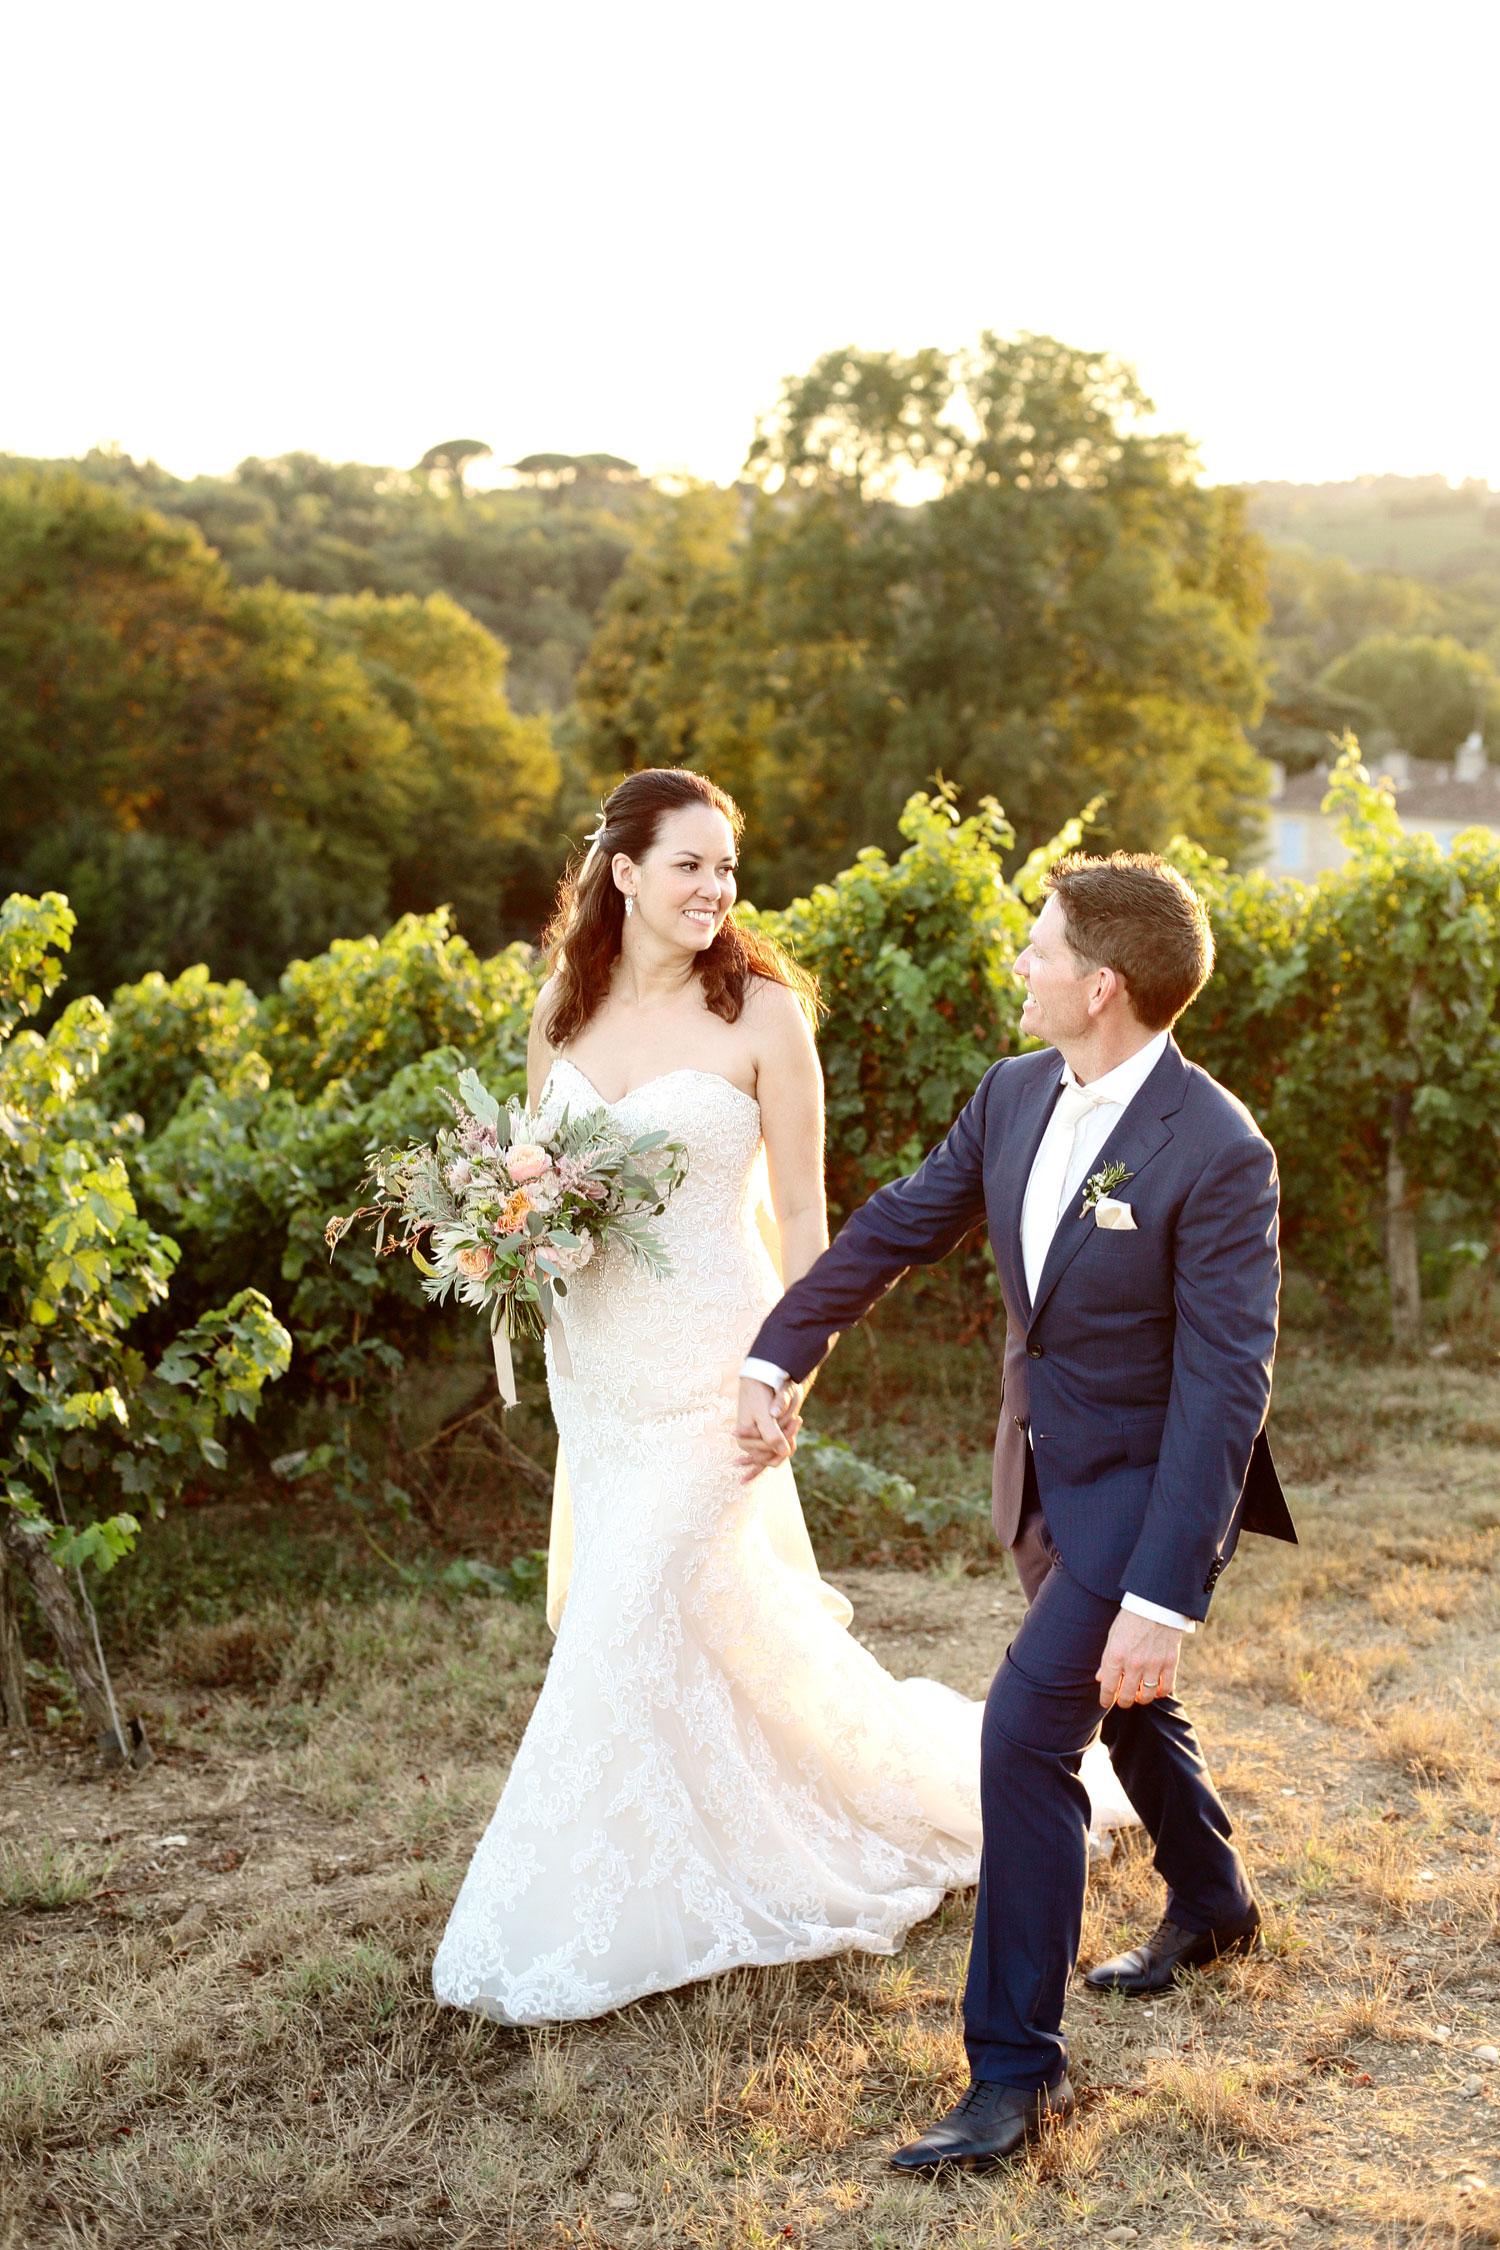 Chateau Lagorce wedding photos bride and groom